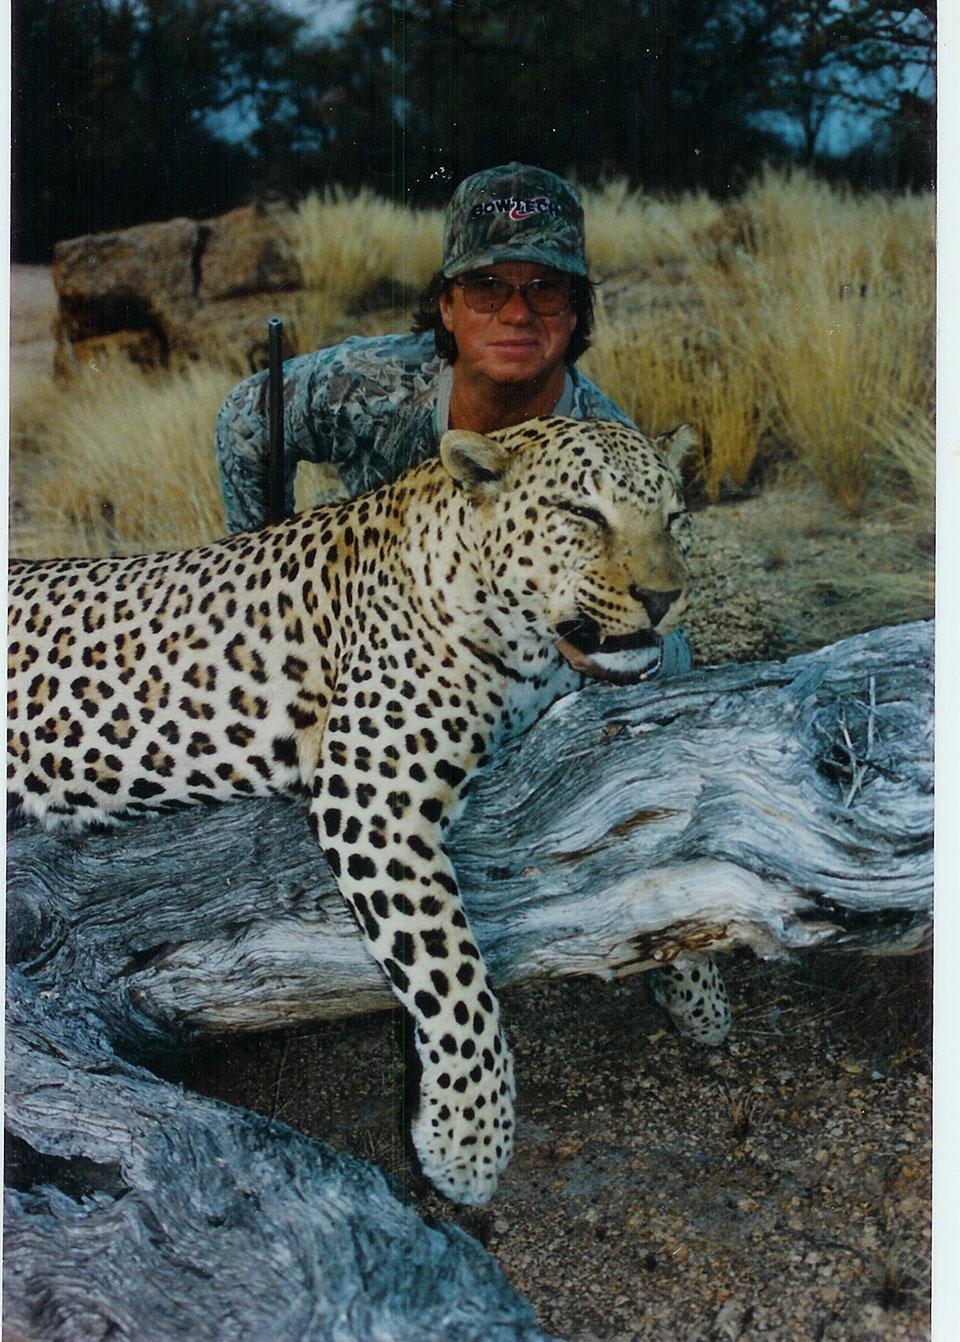 trophy-leopard-photos-Namibia-Africa.jpg